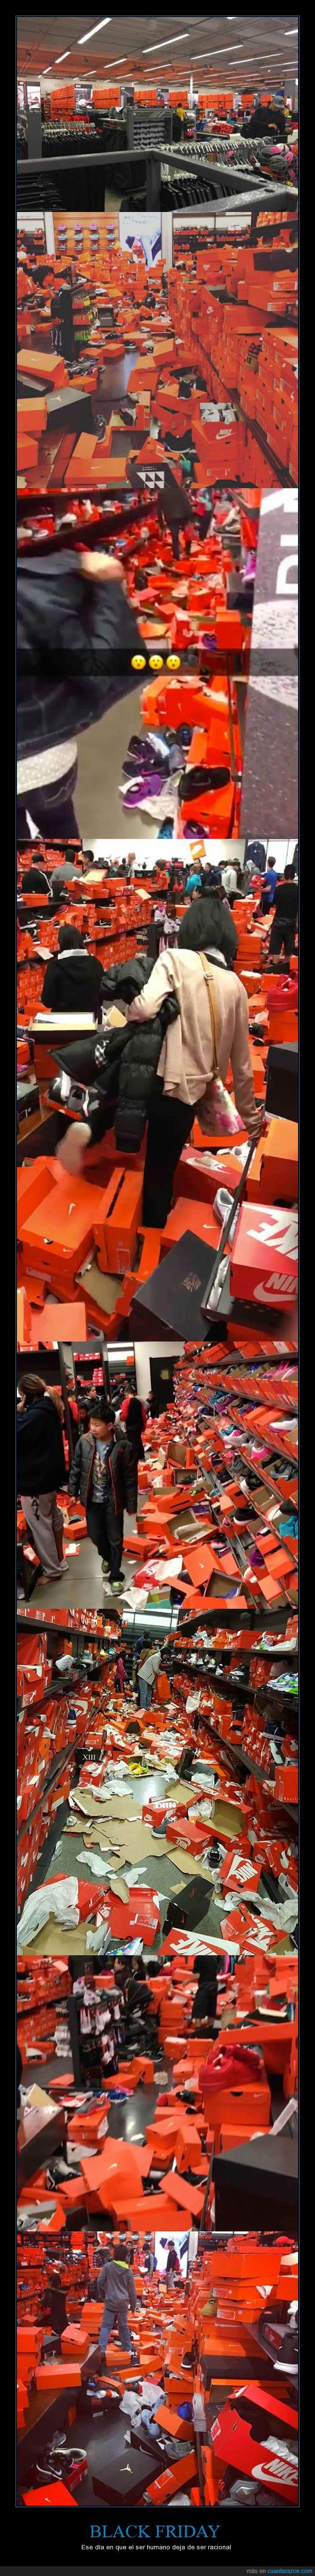 cajas,detrozo,locura,nike,tiendas